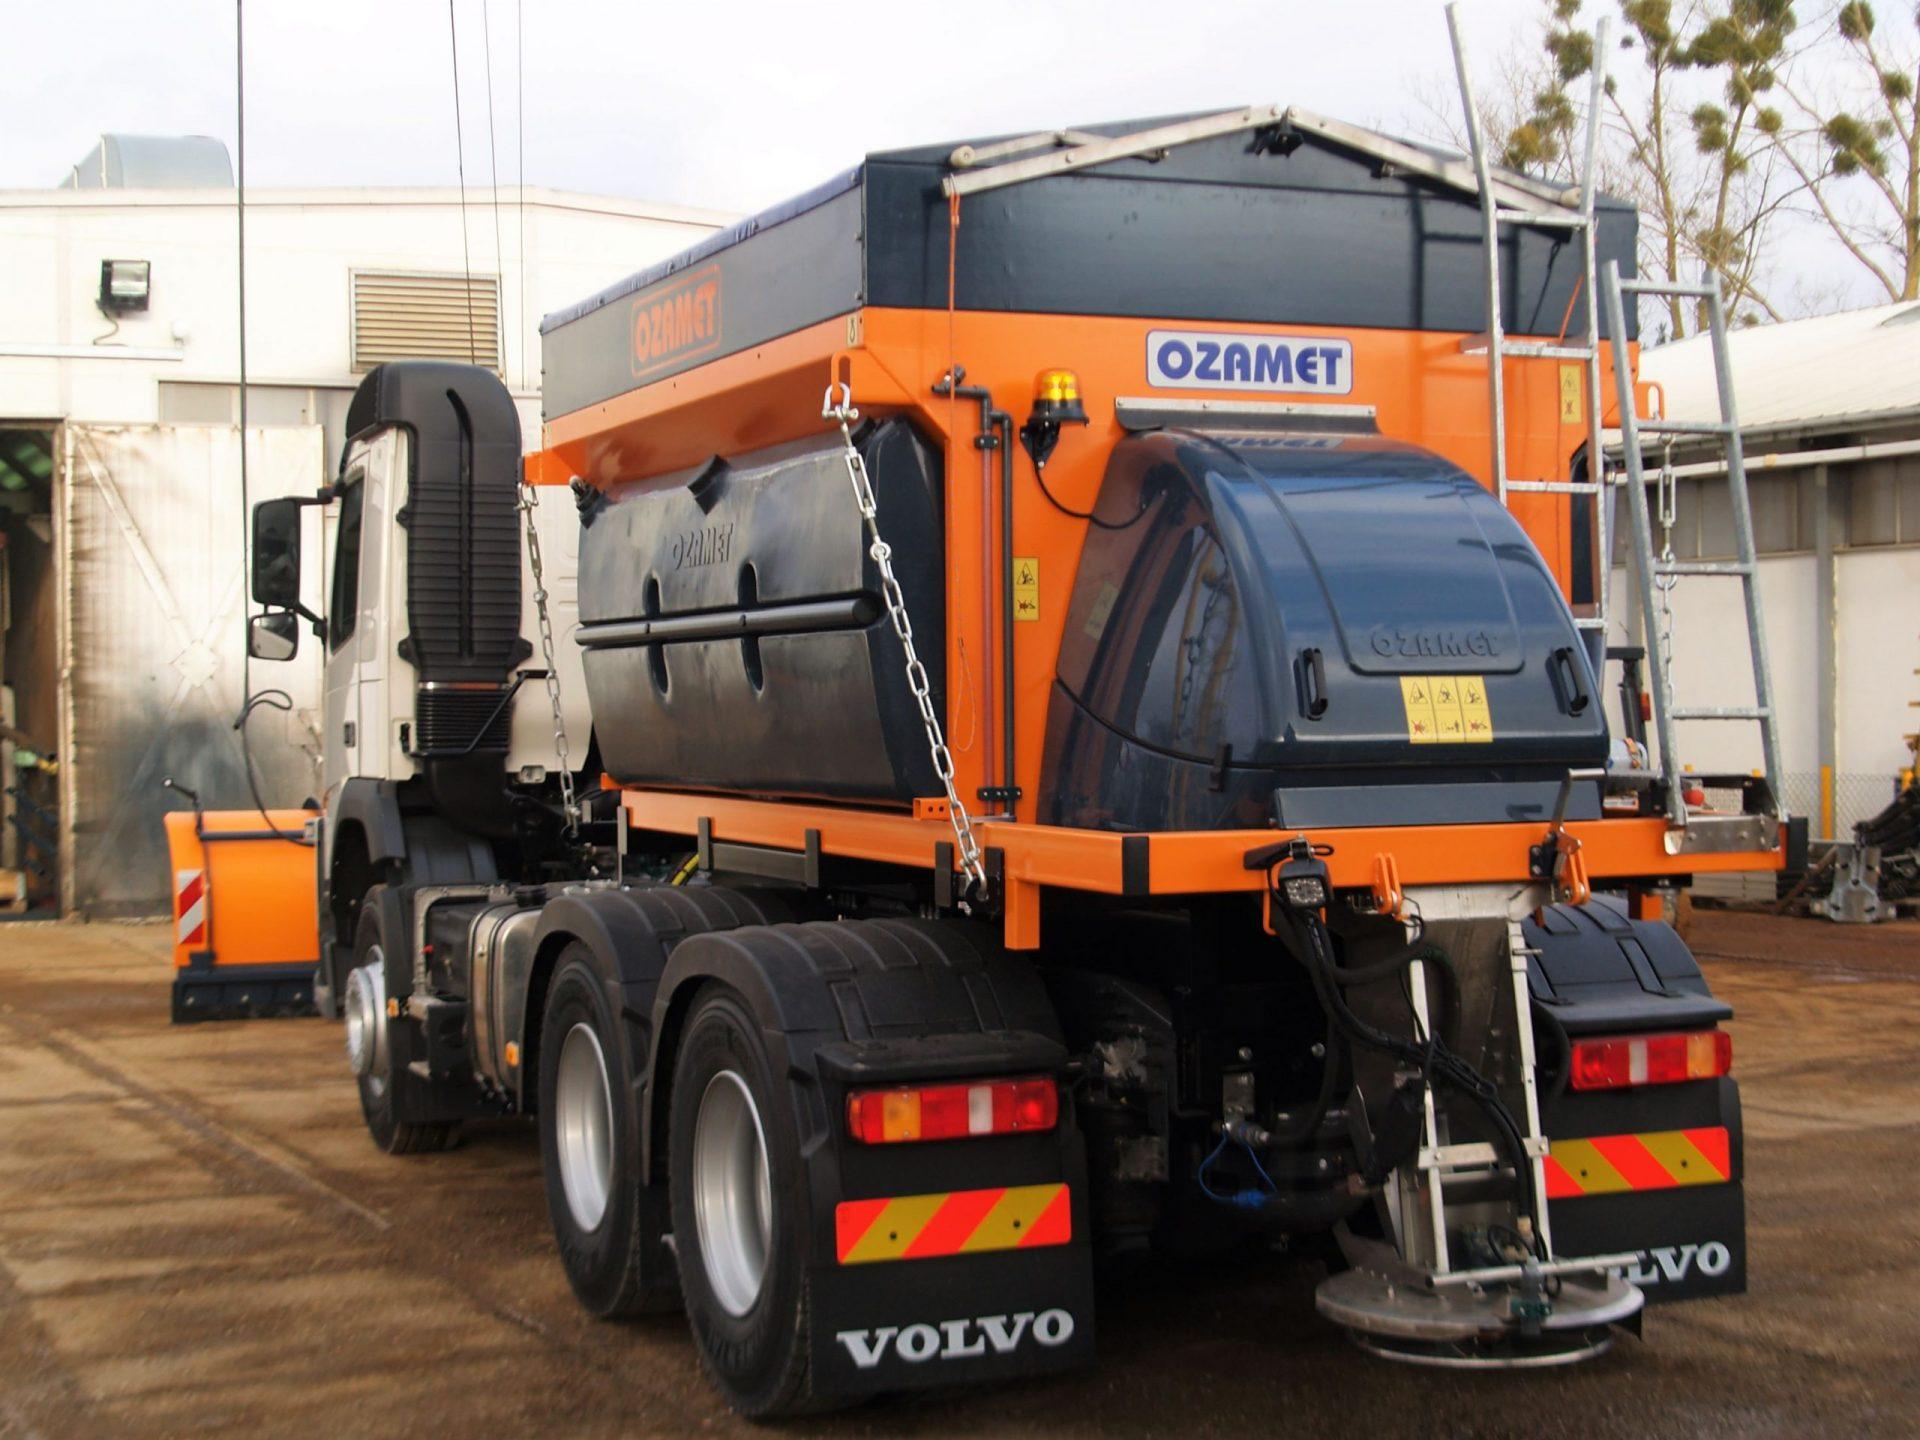 Ozamet snow plow and spreader